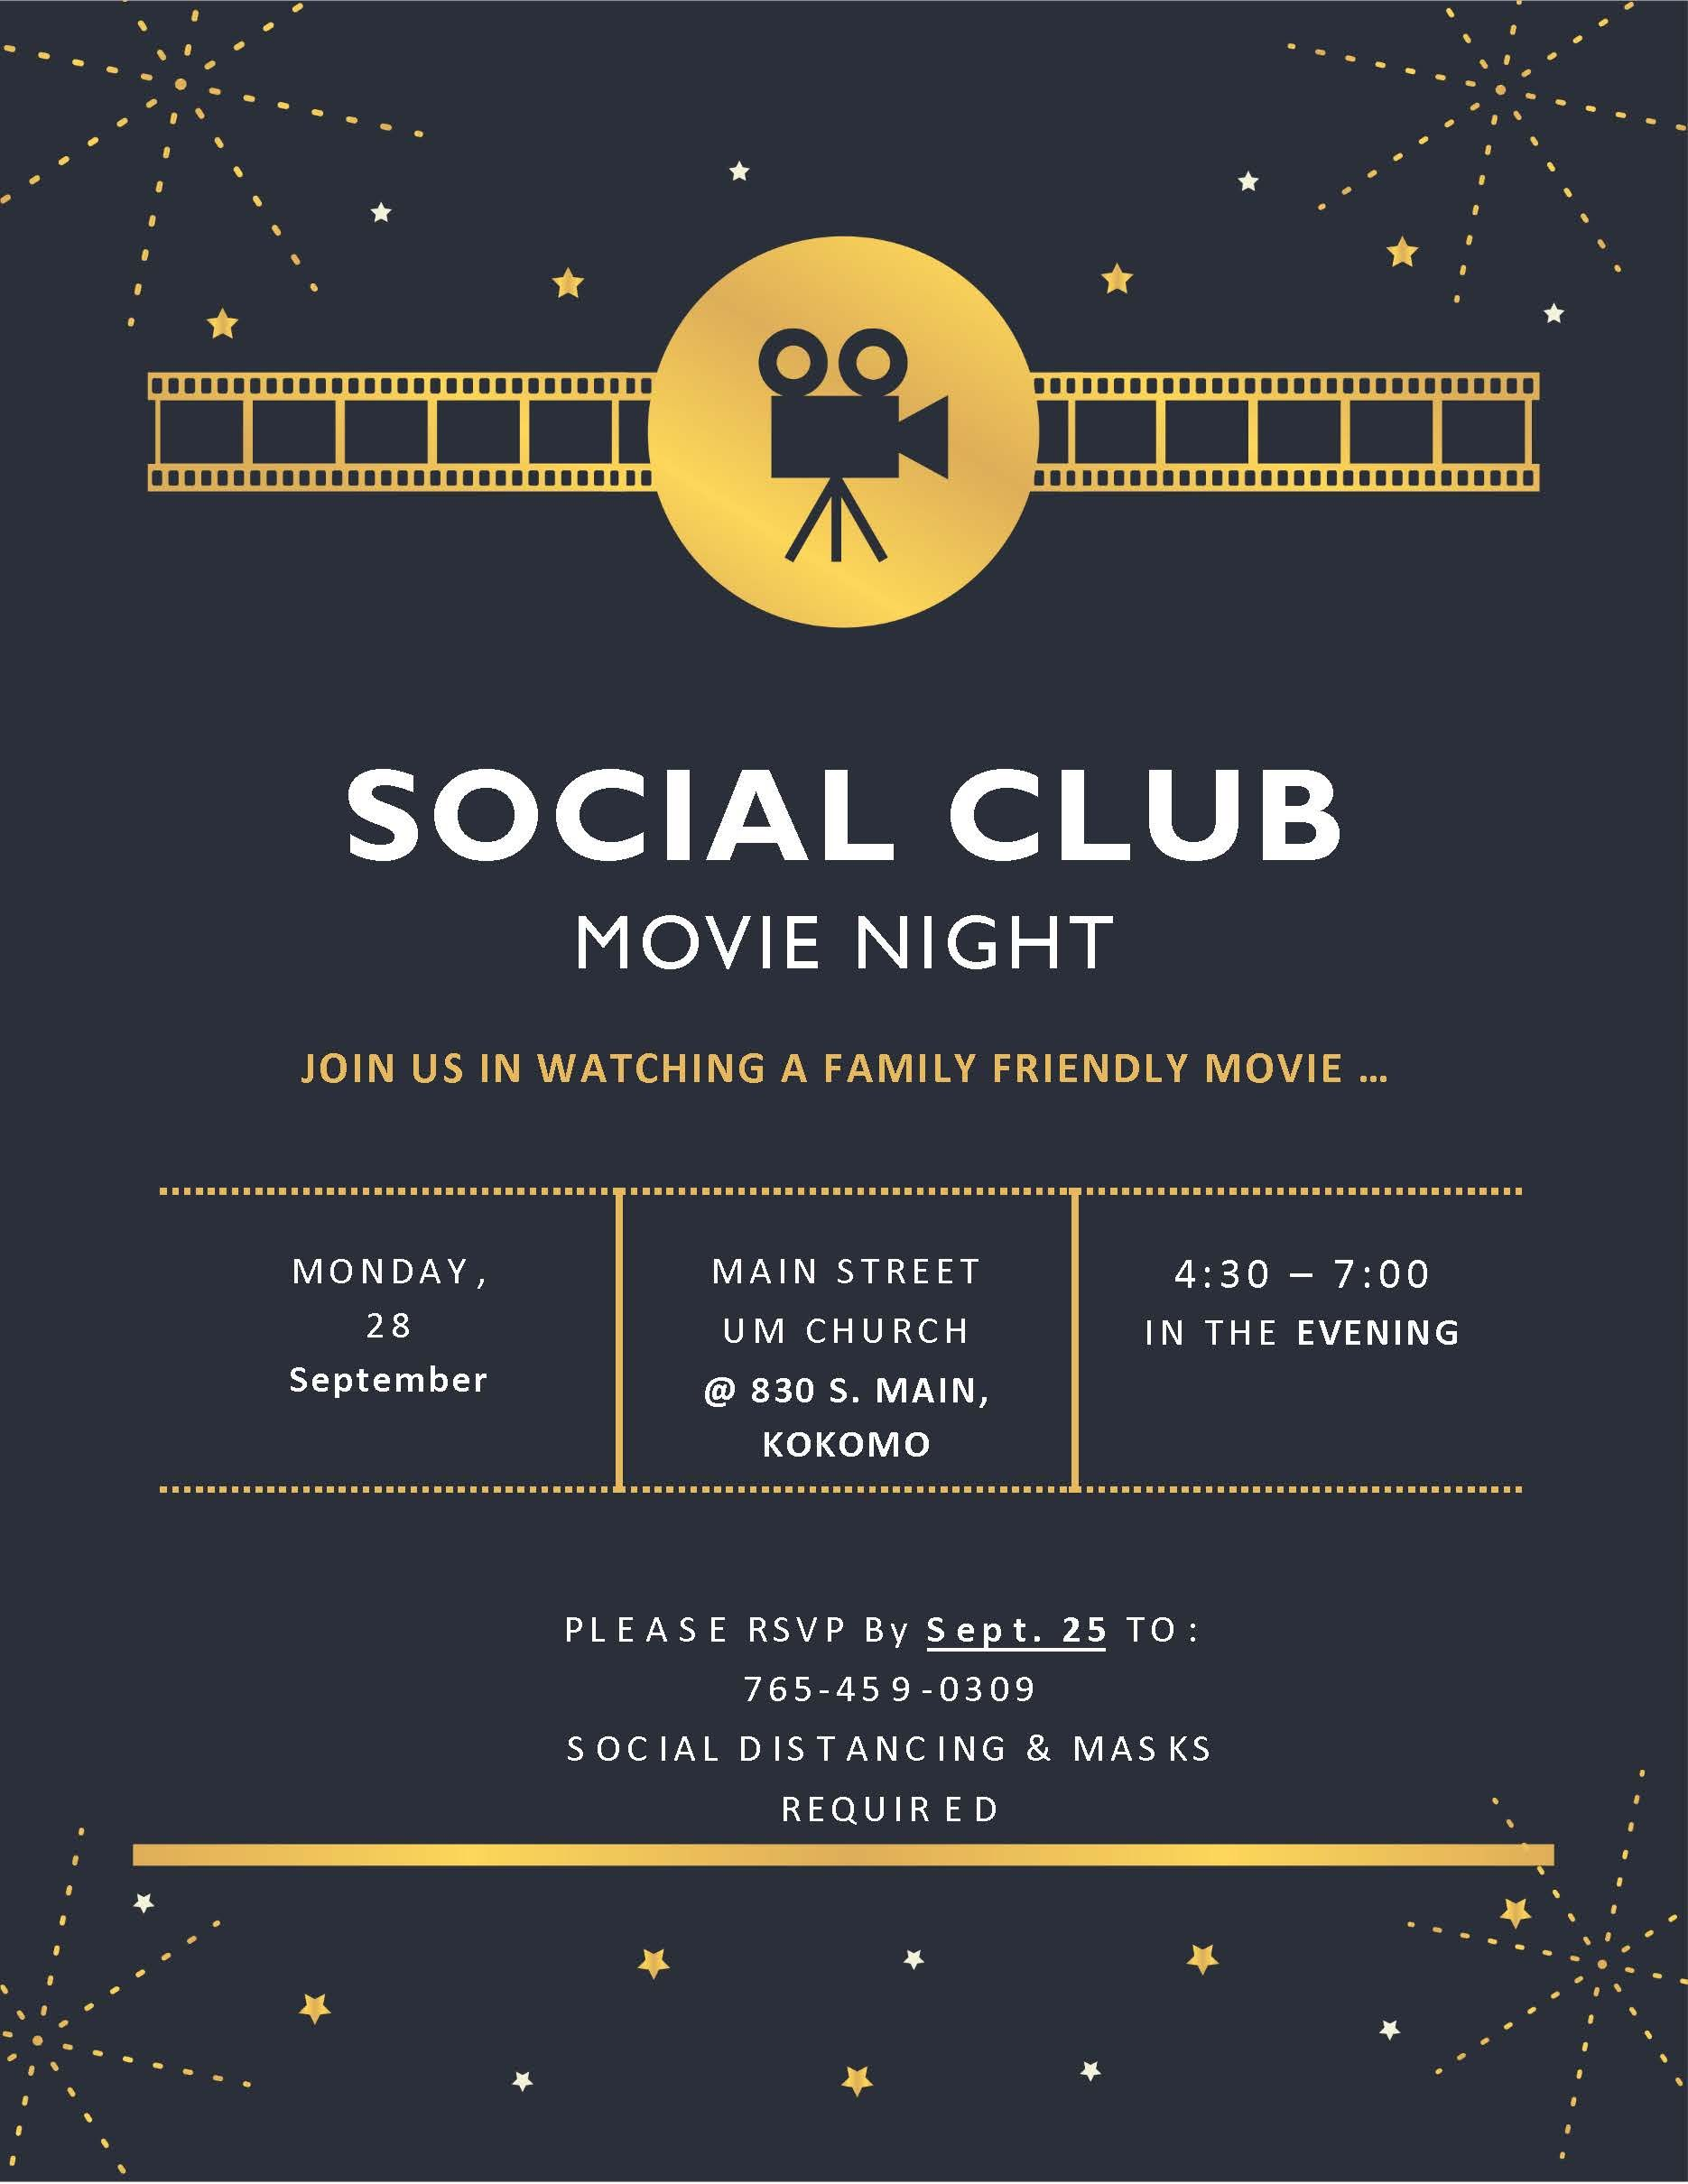 Social Club - Movie Night